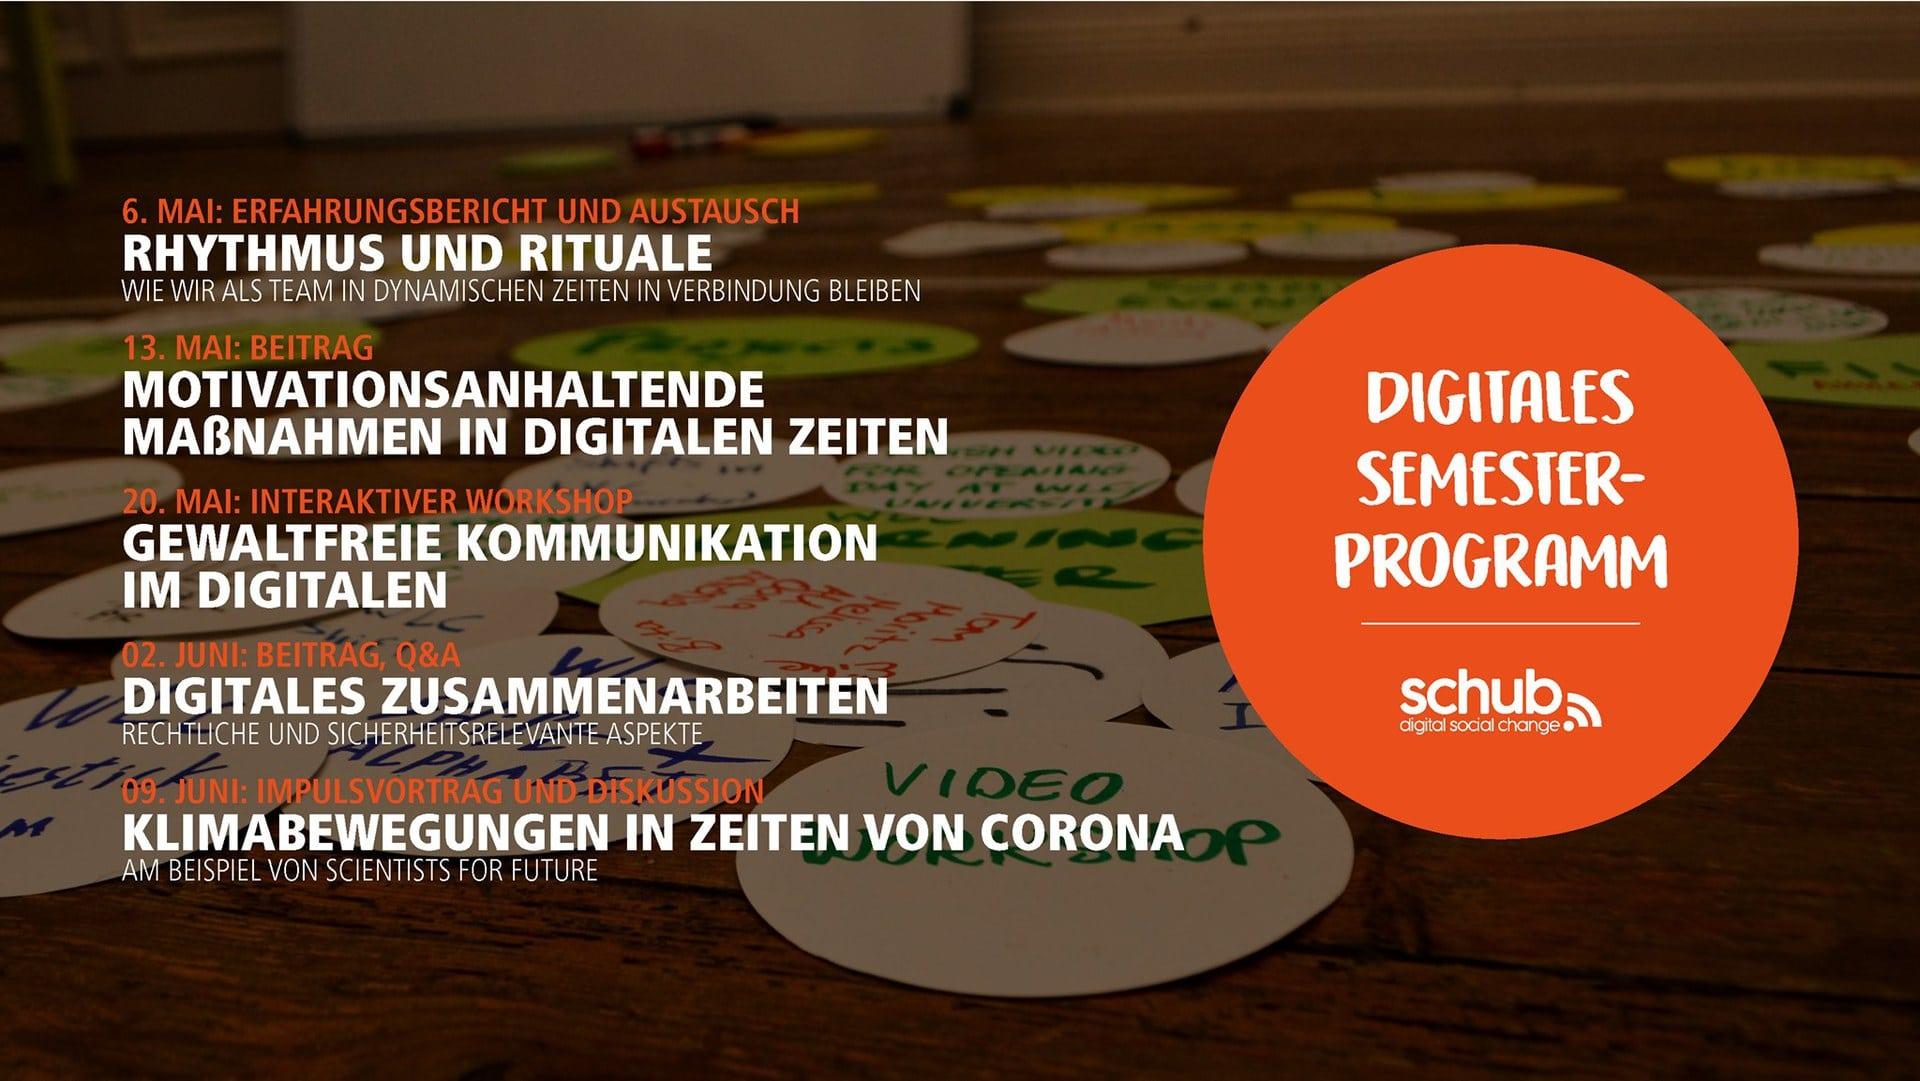 Veranstaltungsübersicht SoSe 2020 - (c) SCHub Leuphana